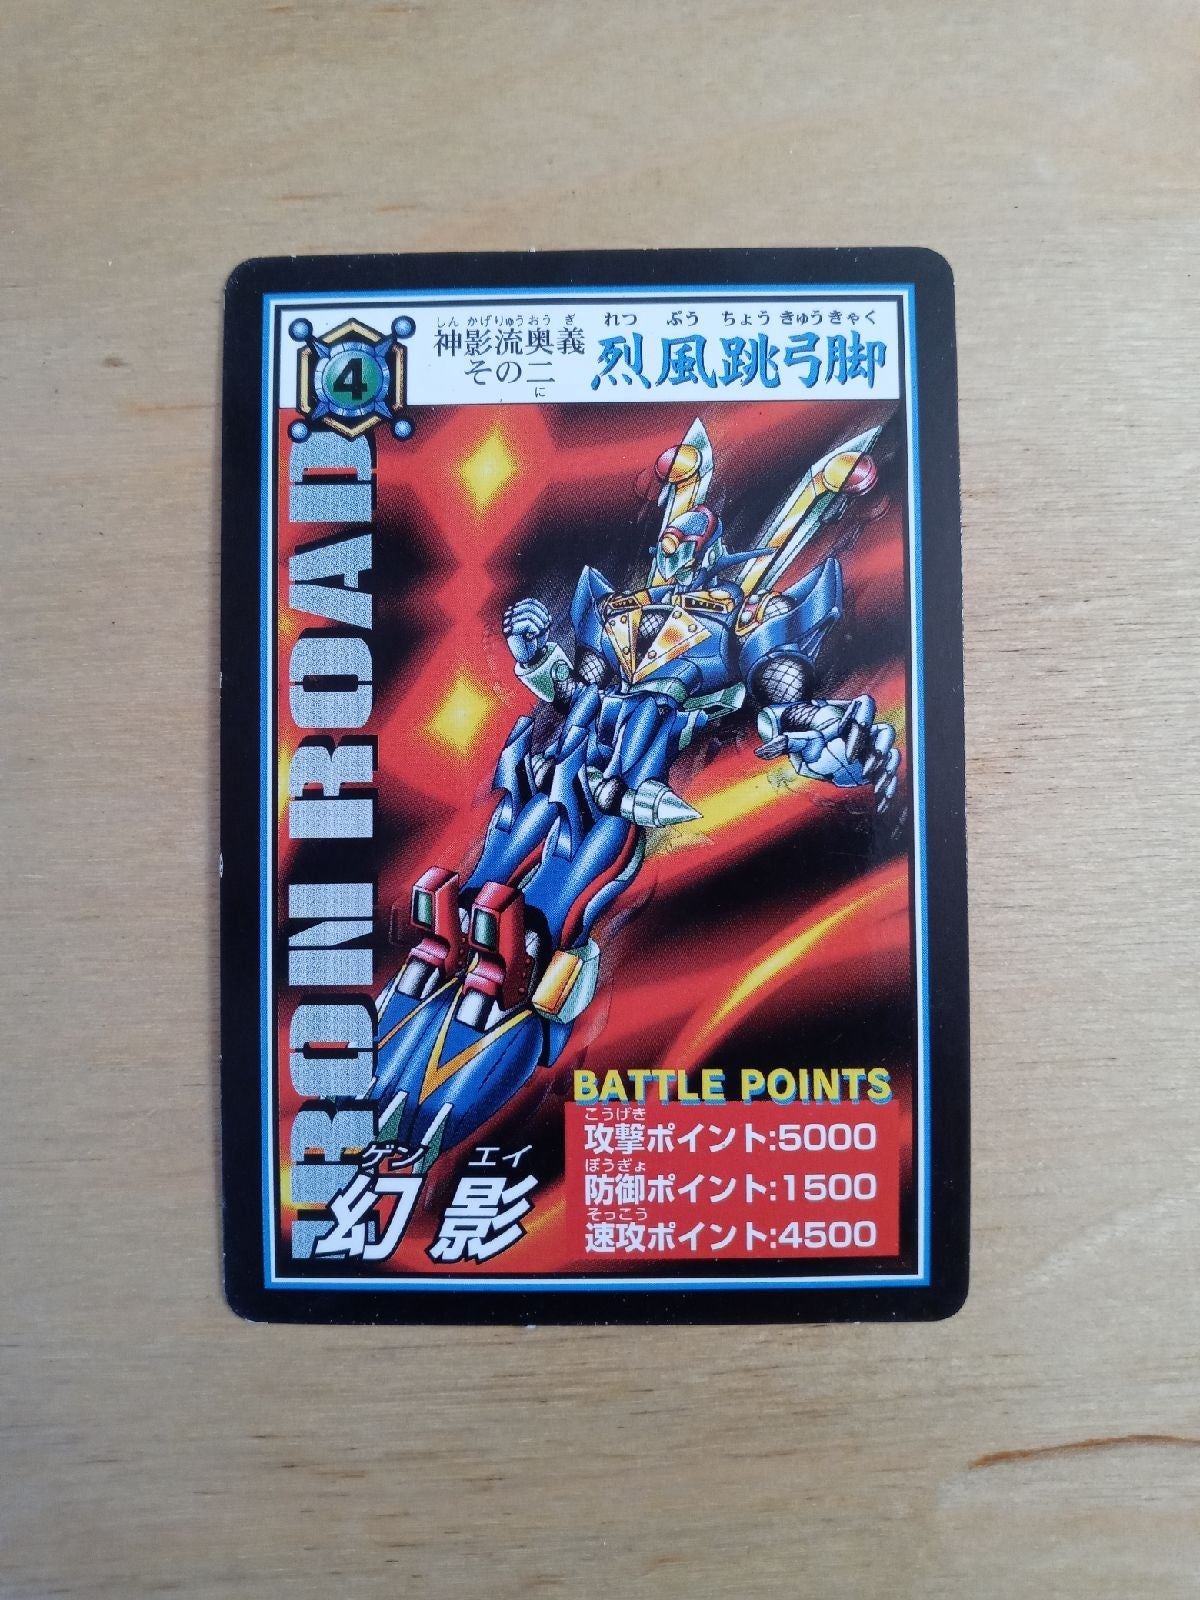 Japanese Iron Road transformer card